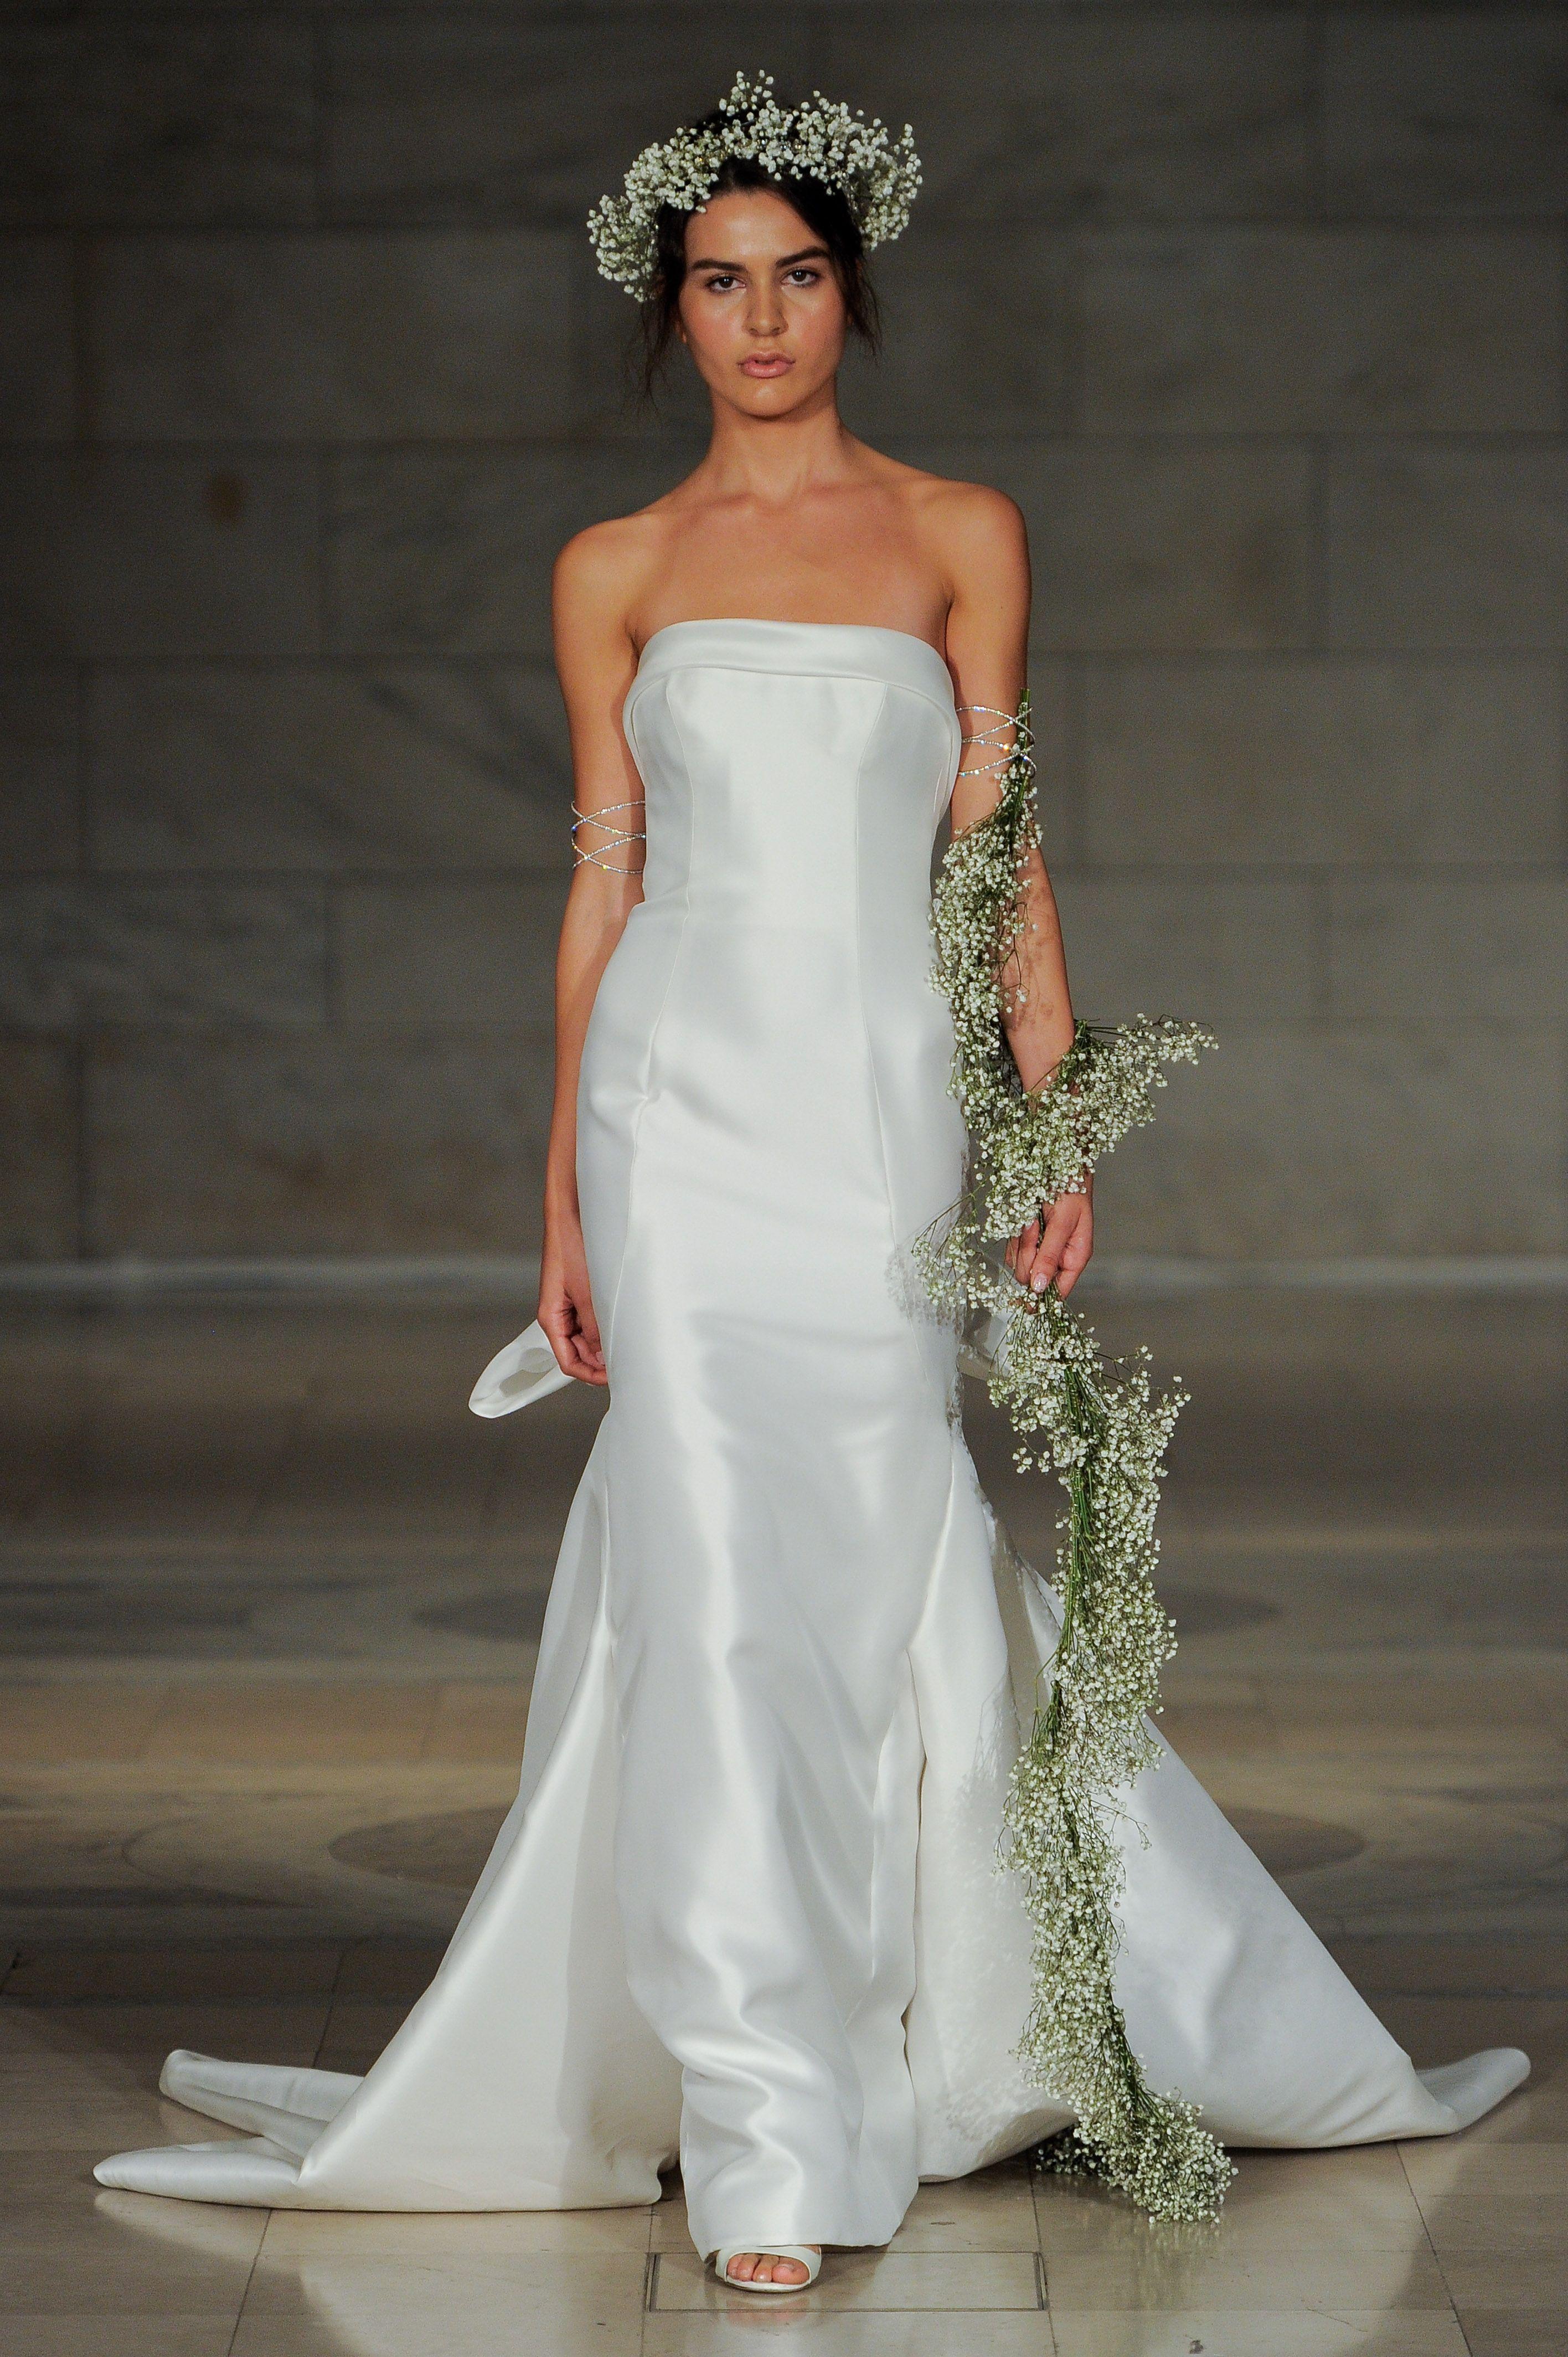 Life beautiful magazine wedding dress